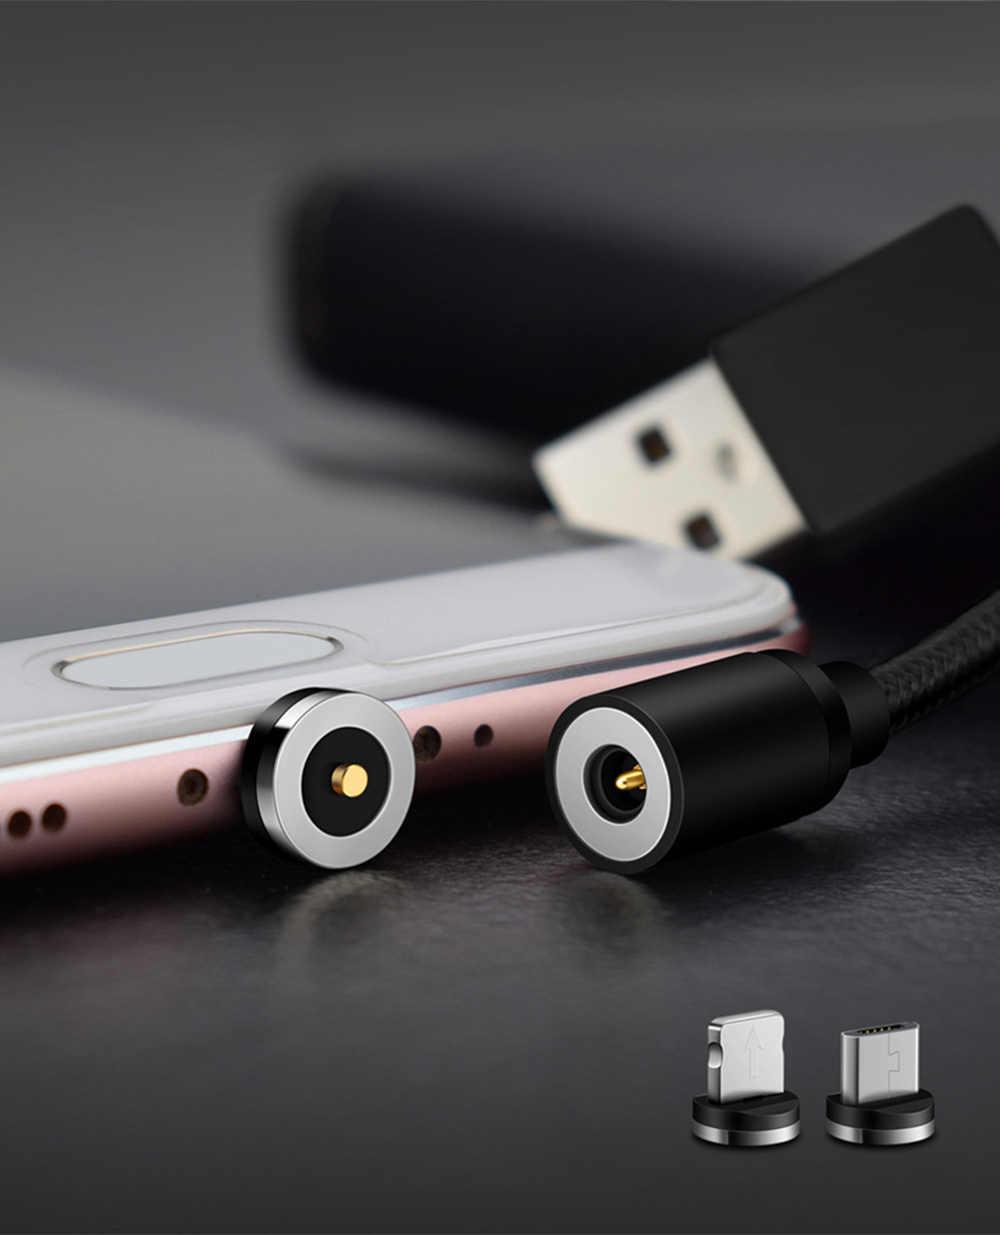 1 M USB Kabel untuk iPhone 7 Kabel Micro USB Magnetic Charger untuk Samsung S9 Xiaomi Ponsel Magnet usb Mikro Cabo